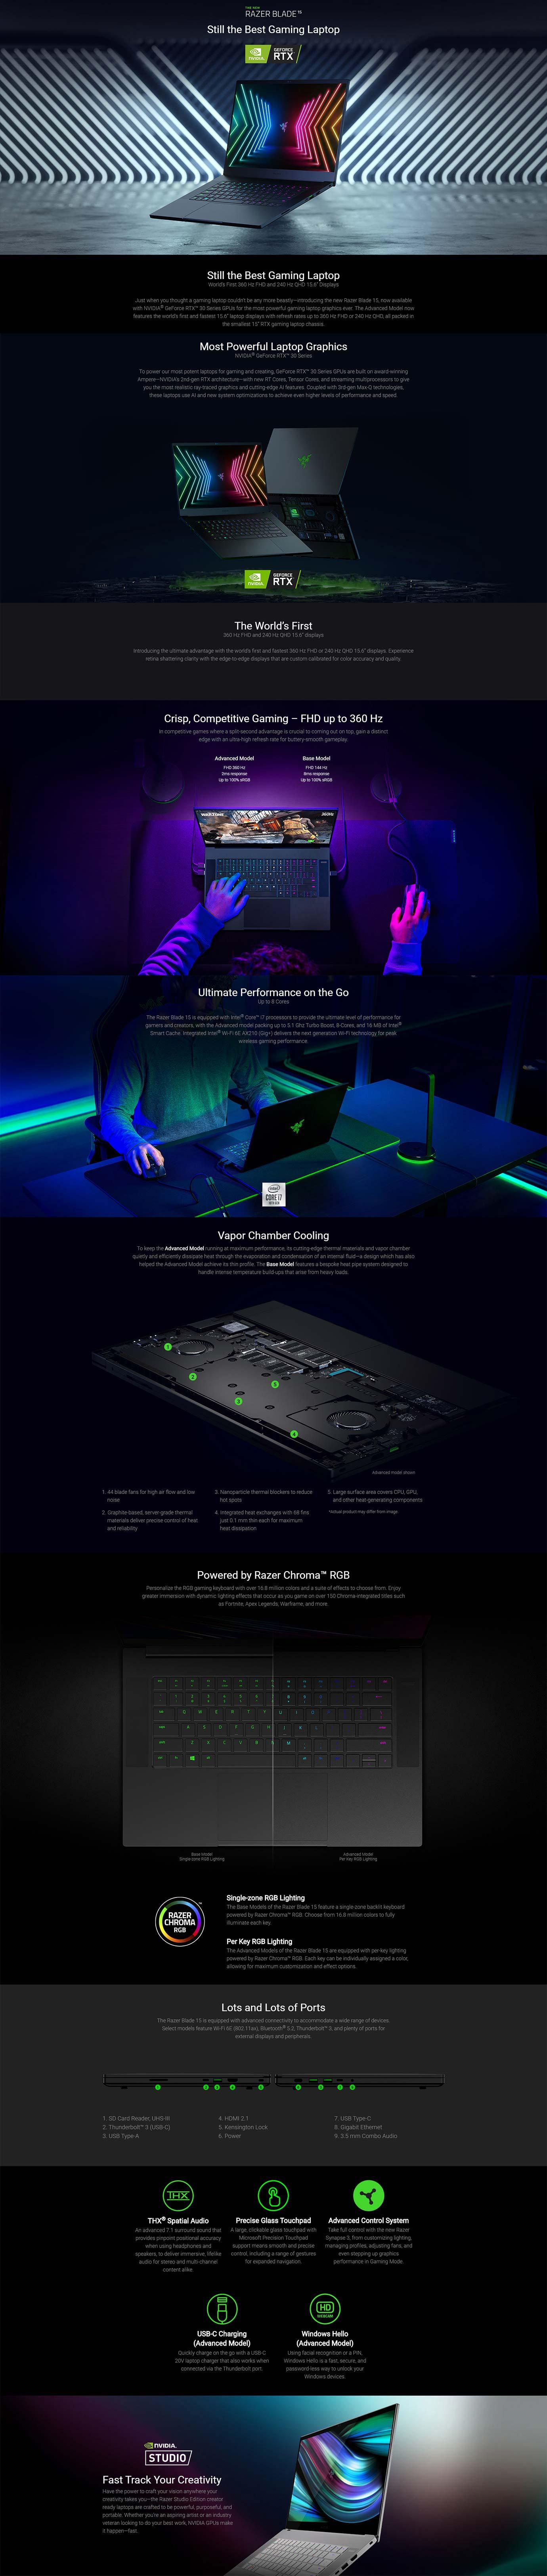 Razer Blade 15 Advanced Model 360Hz Laptop